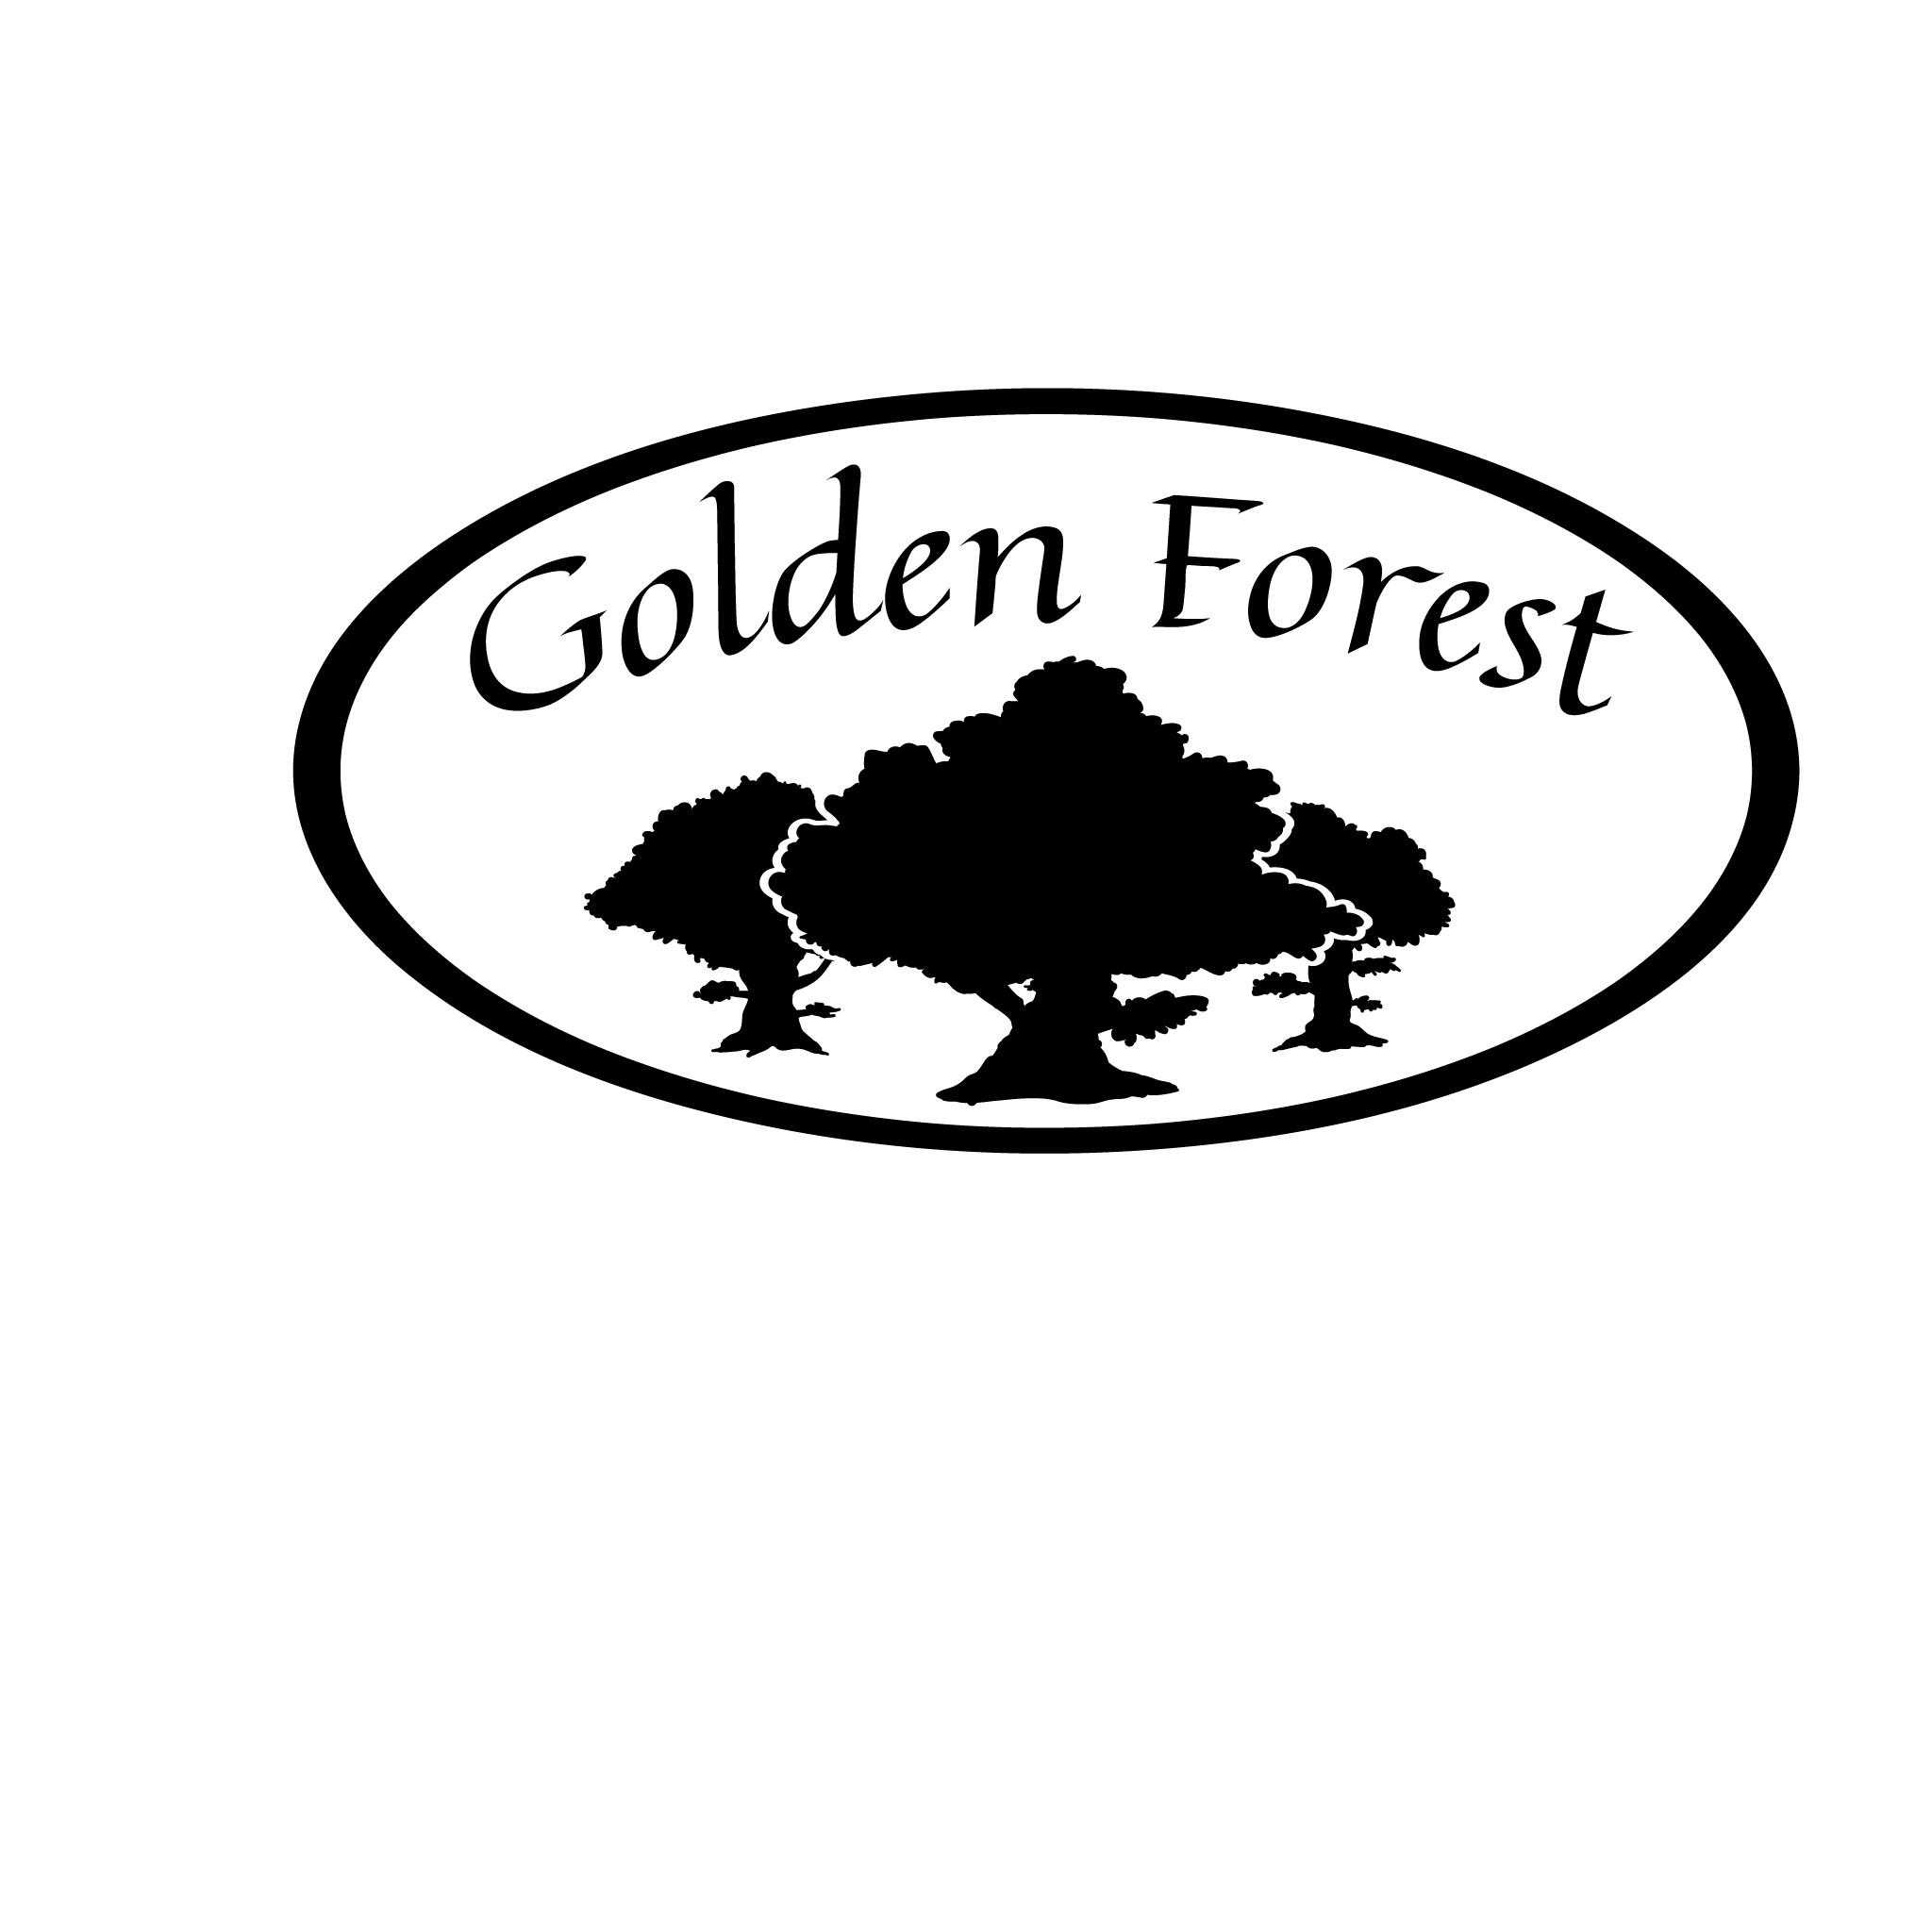 Golden Forest Logo - B&W